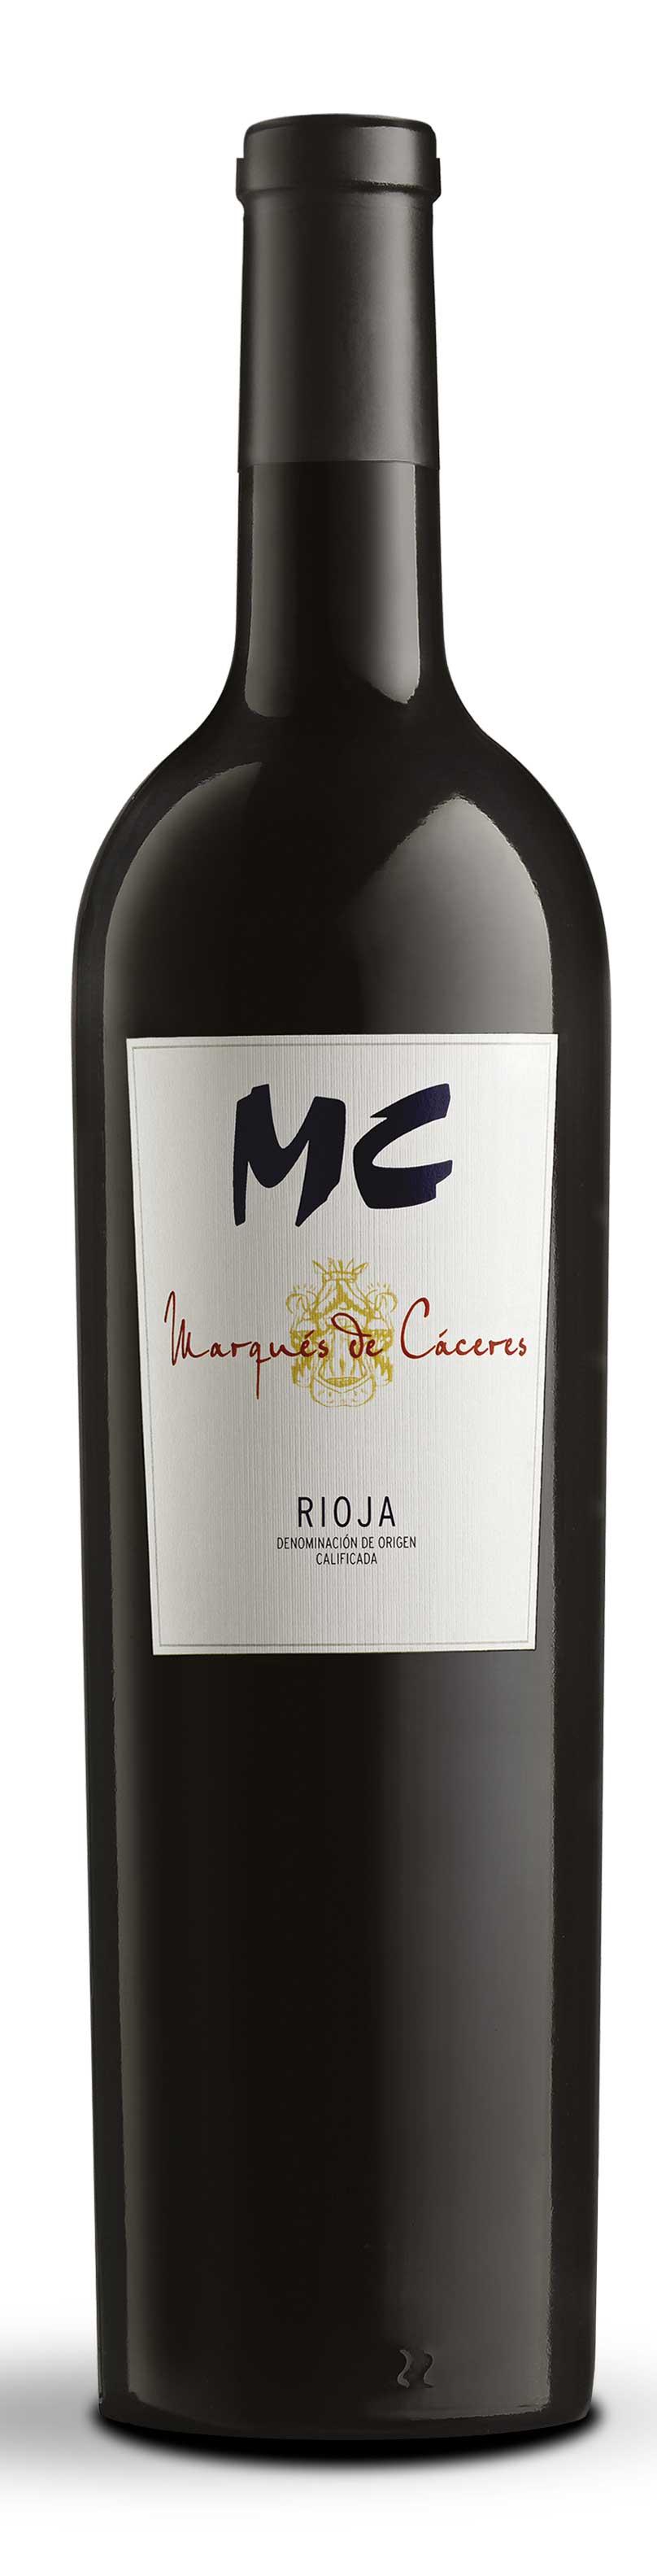 MC ( Bodegas Marqués de Cáceres ) 2012